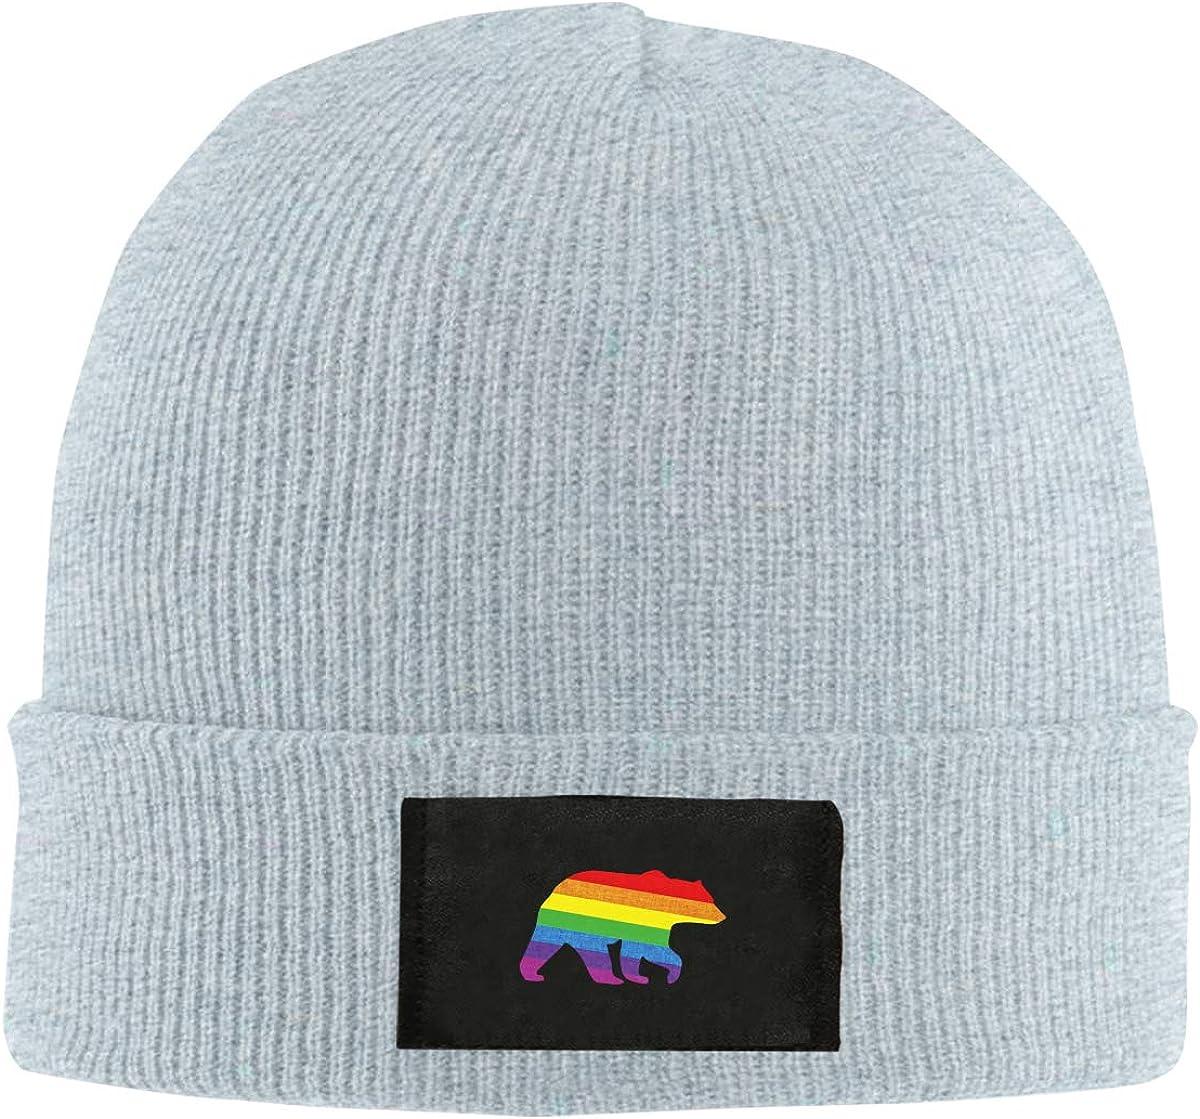 Gay Bear Top Level Beanie Men Women Unisex Stylish Slouch Beanie Hats Black